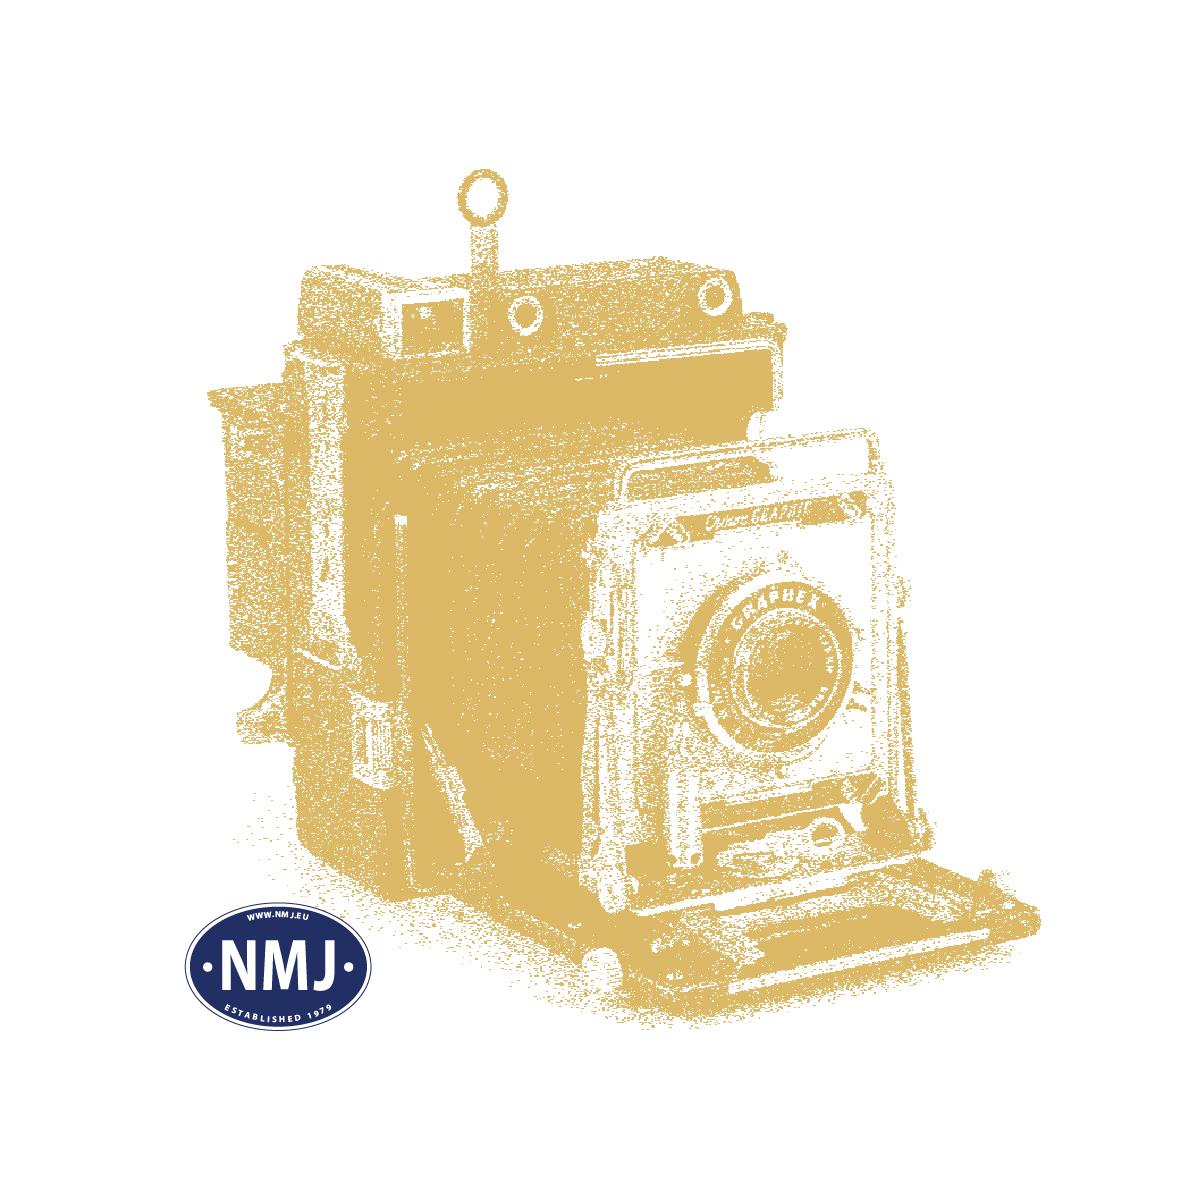 NMJT85.101 - NMJ Topline NSB Di8.709, DC